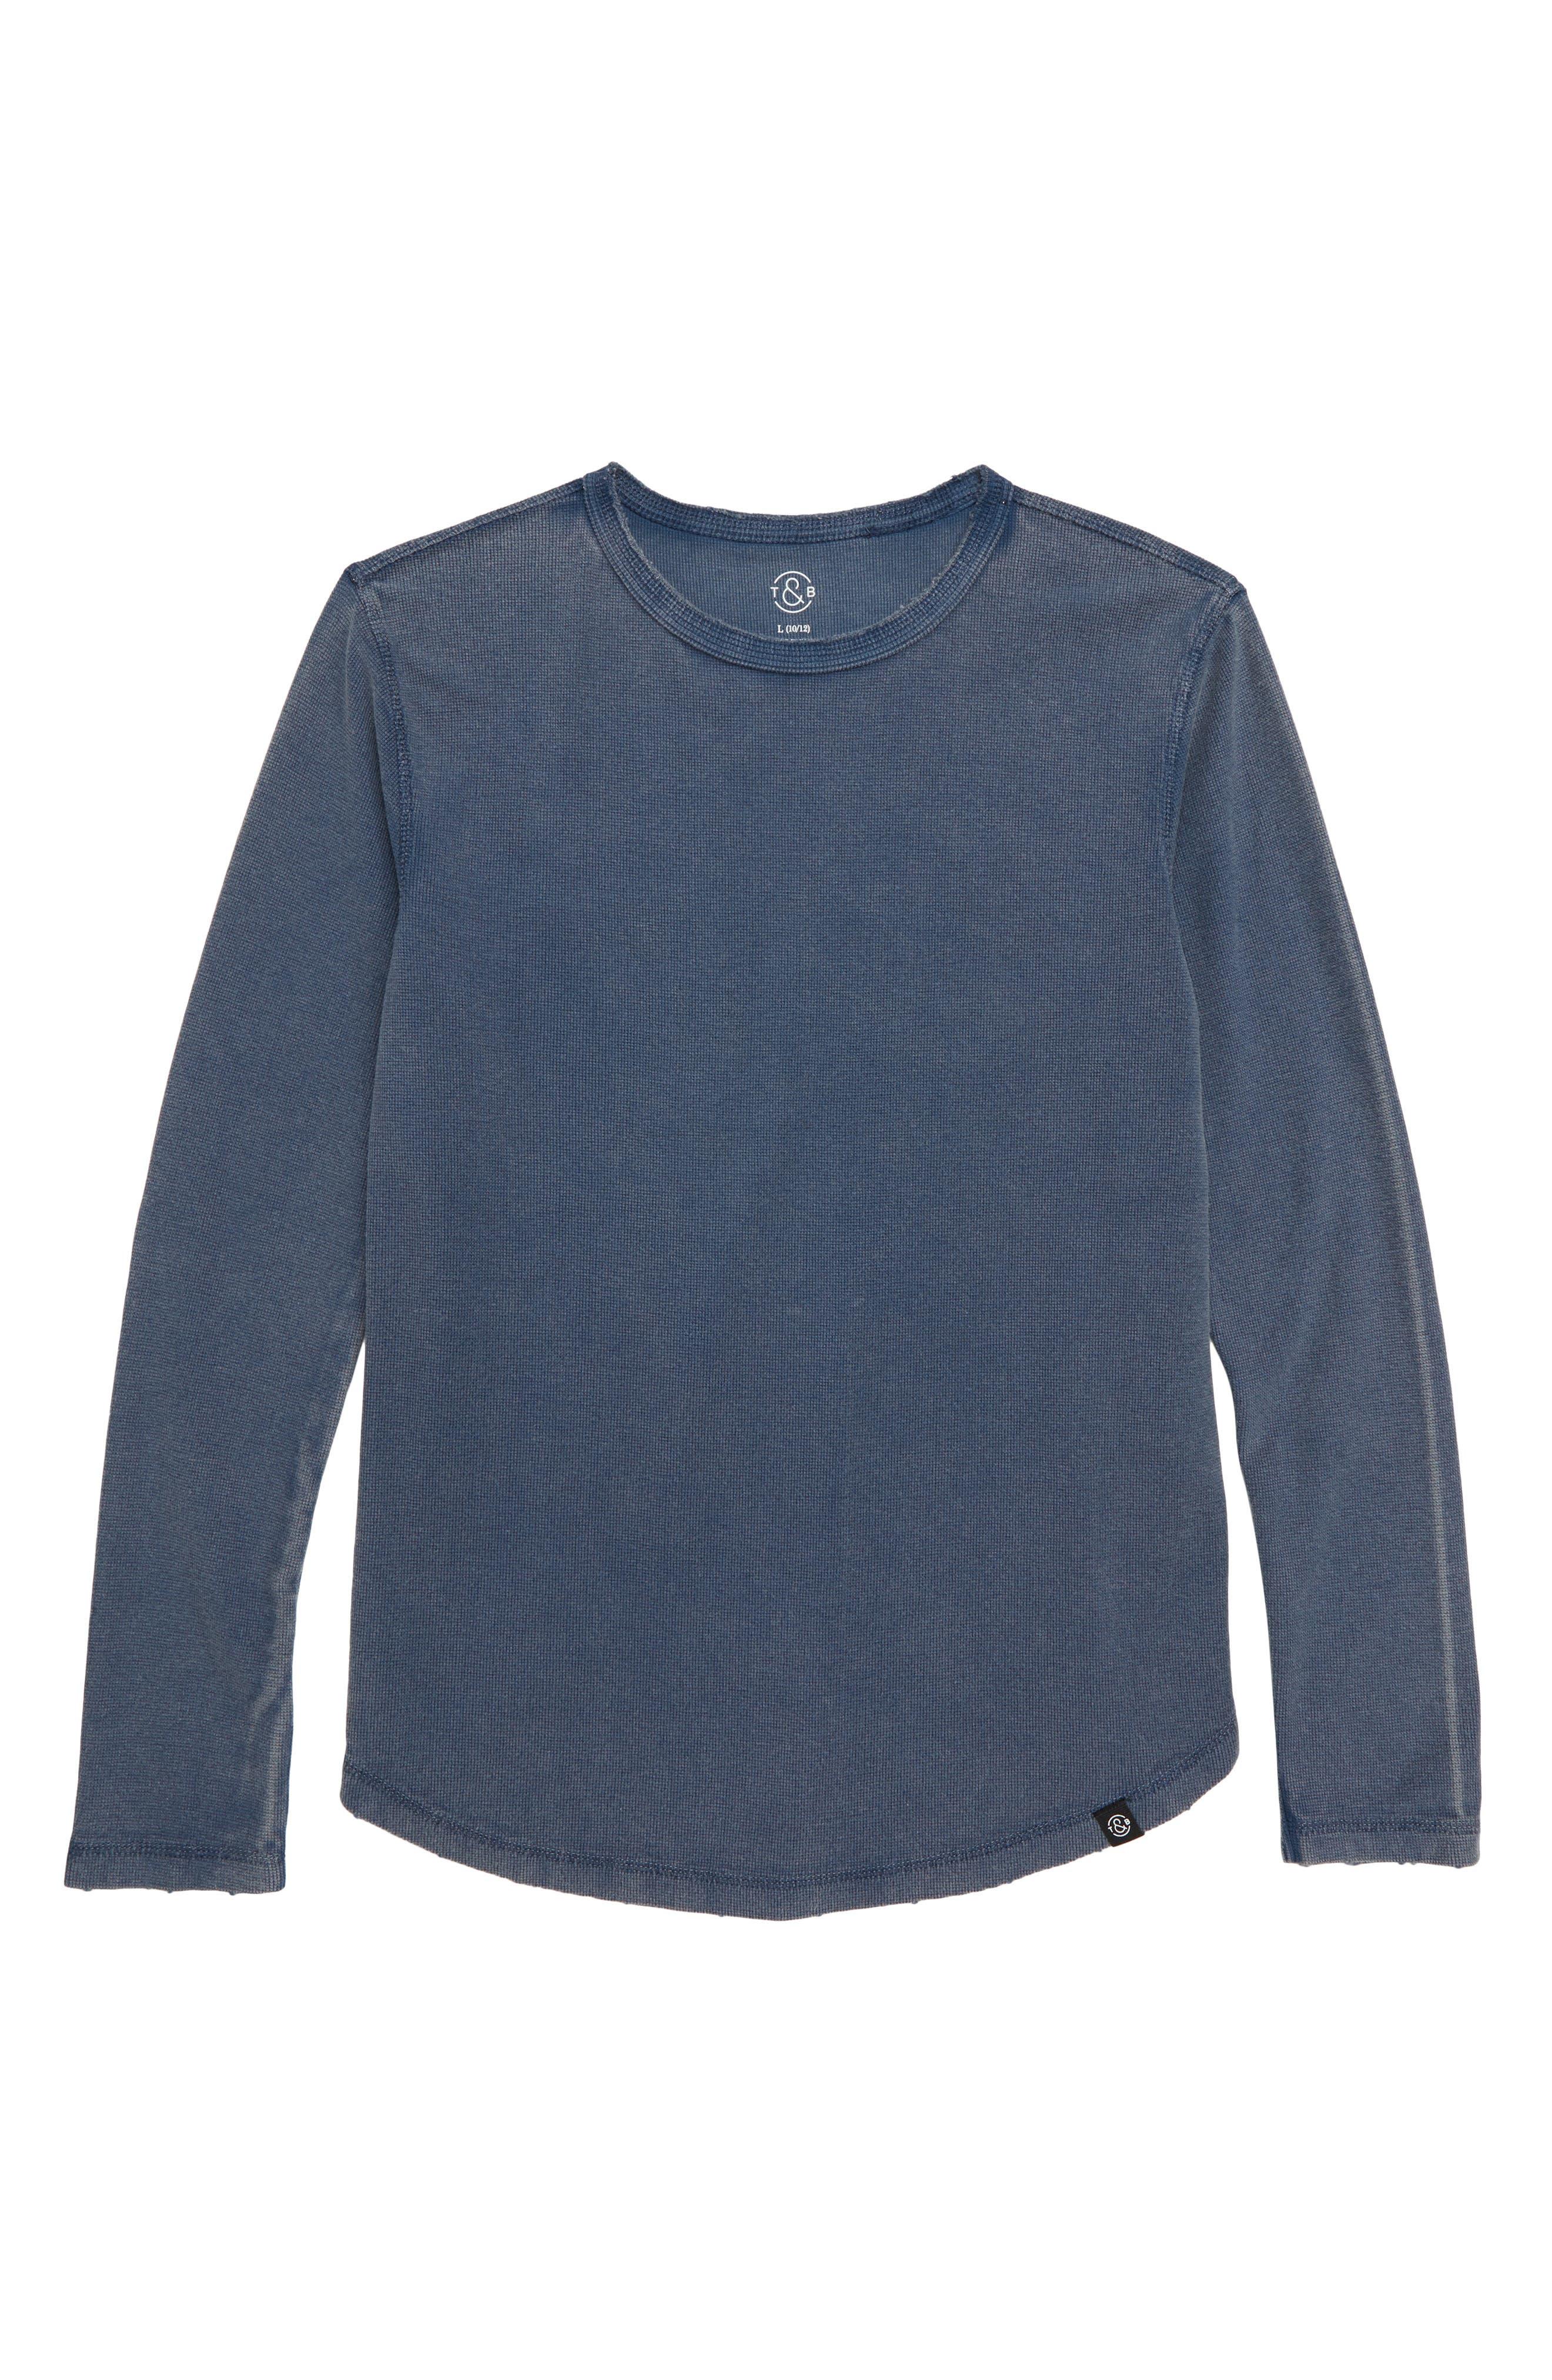 Boys Treasure  Bond Distressed Waffle Long Sleeve TShirt Size L (1012)  Blue